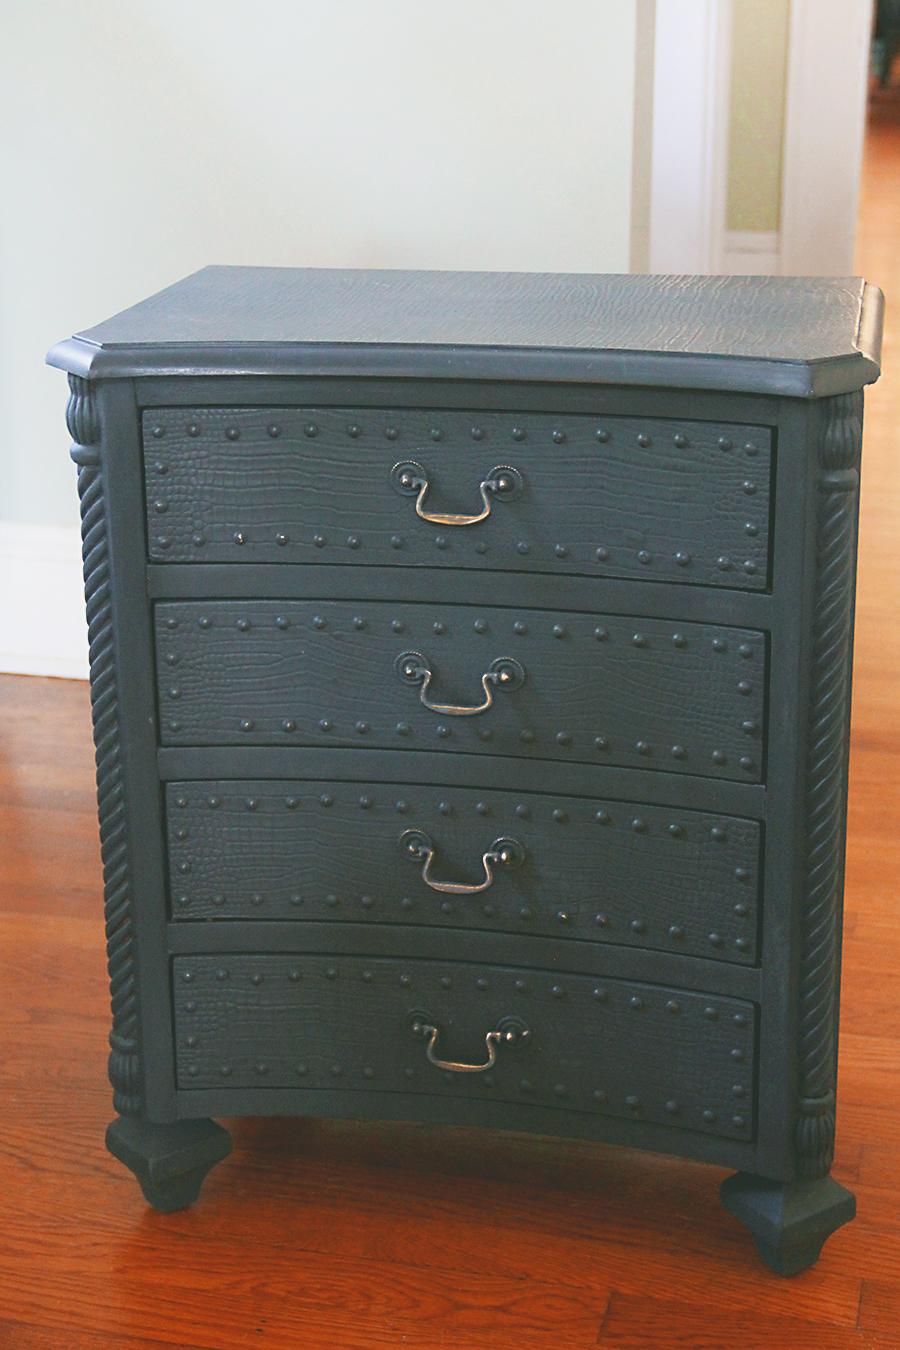 jo-torrijos-a-simpler-design-painted-furniture-19.jpeg